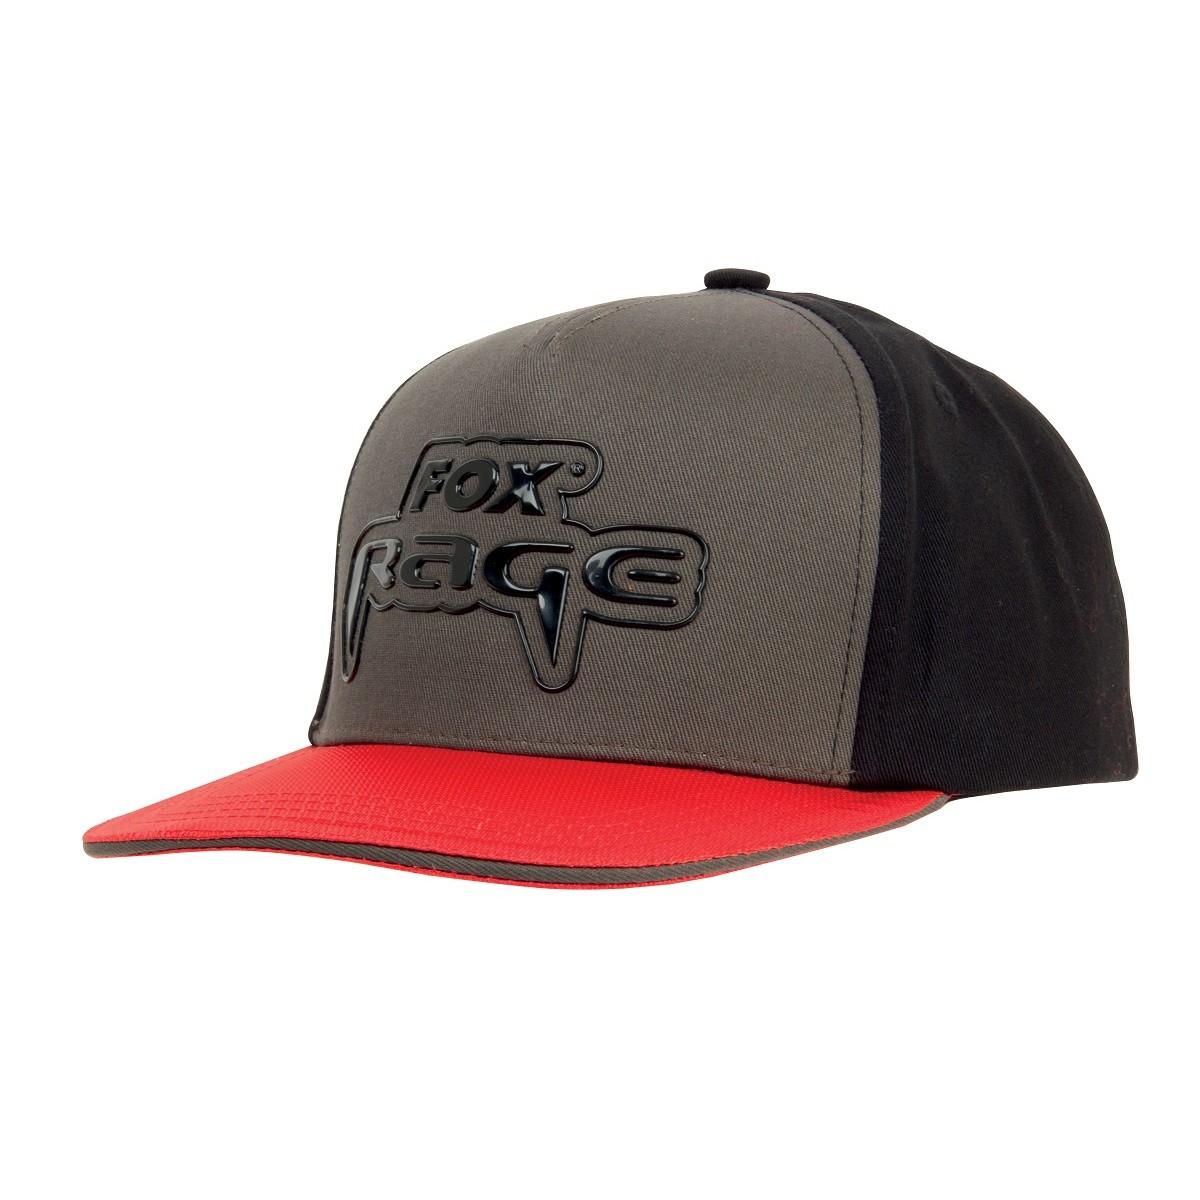 Fox Rage Snapback Black / Grey/ Red